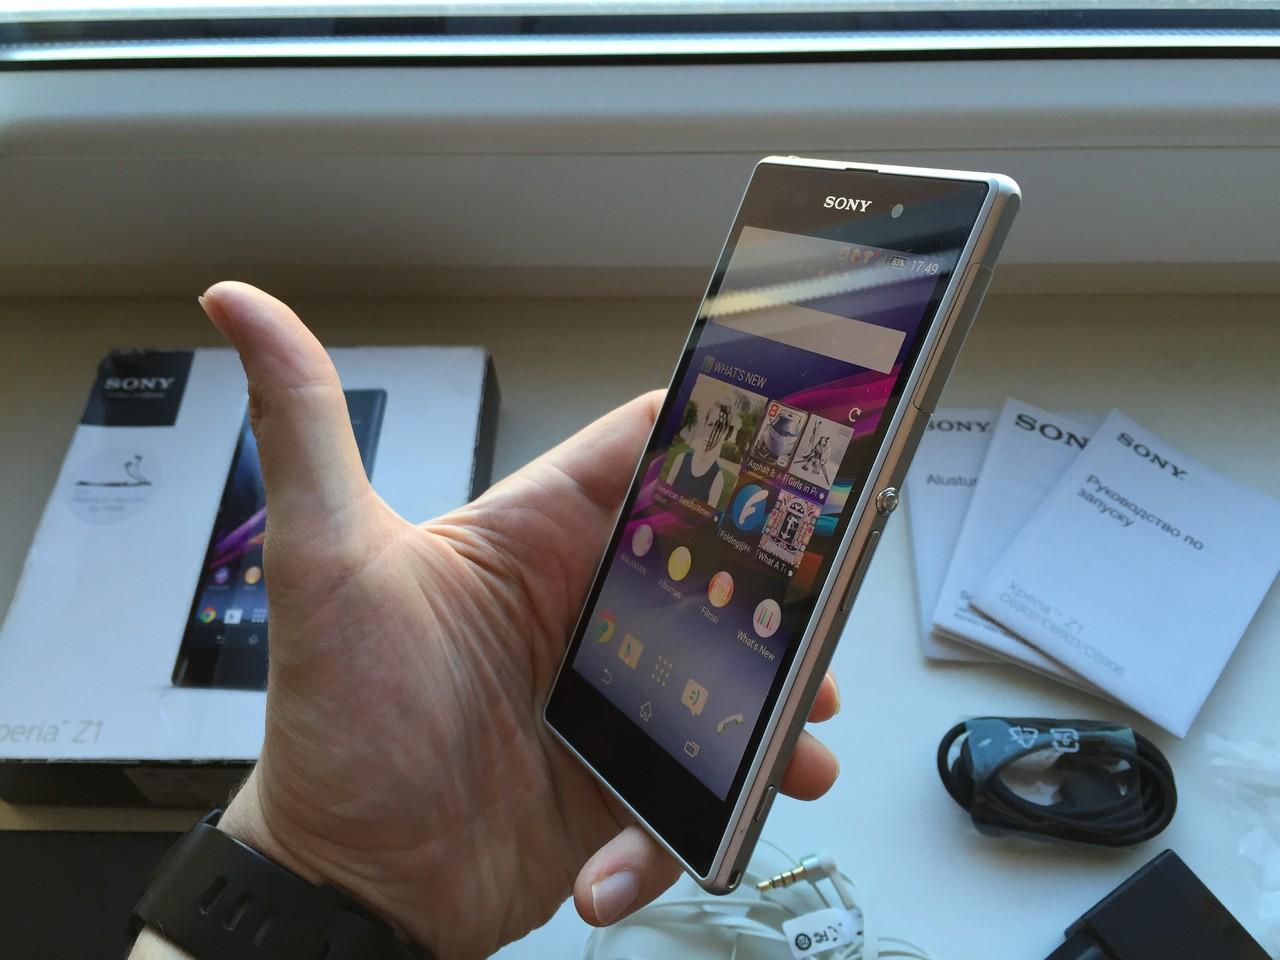 картинка Sony Xperia Z1 su 2.2 GHz Quad Core 4G  от магазина Одежда+